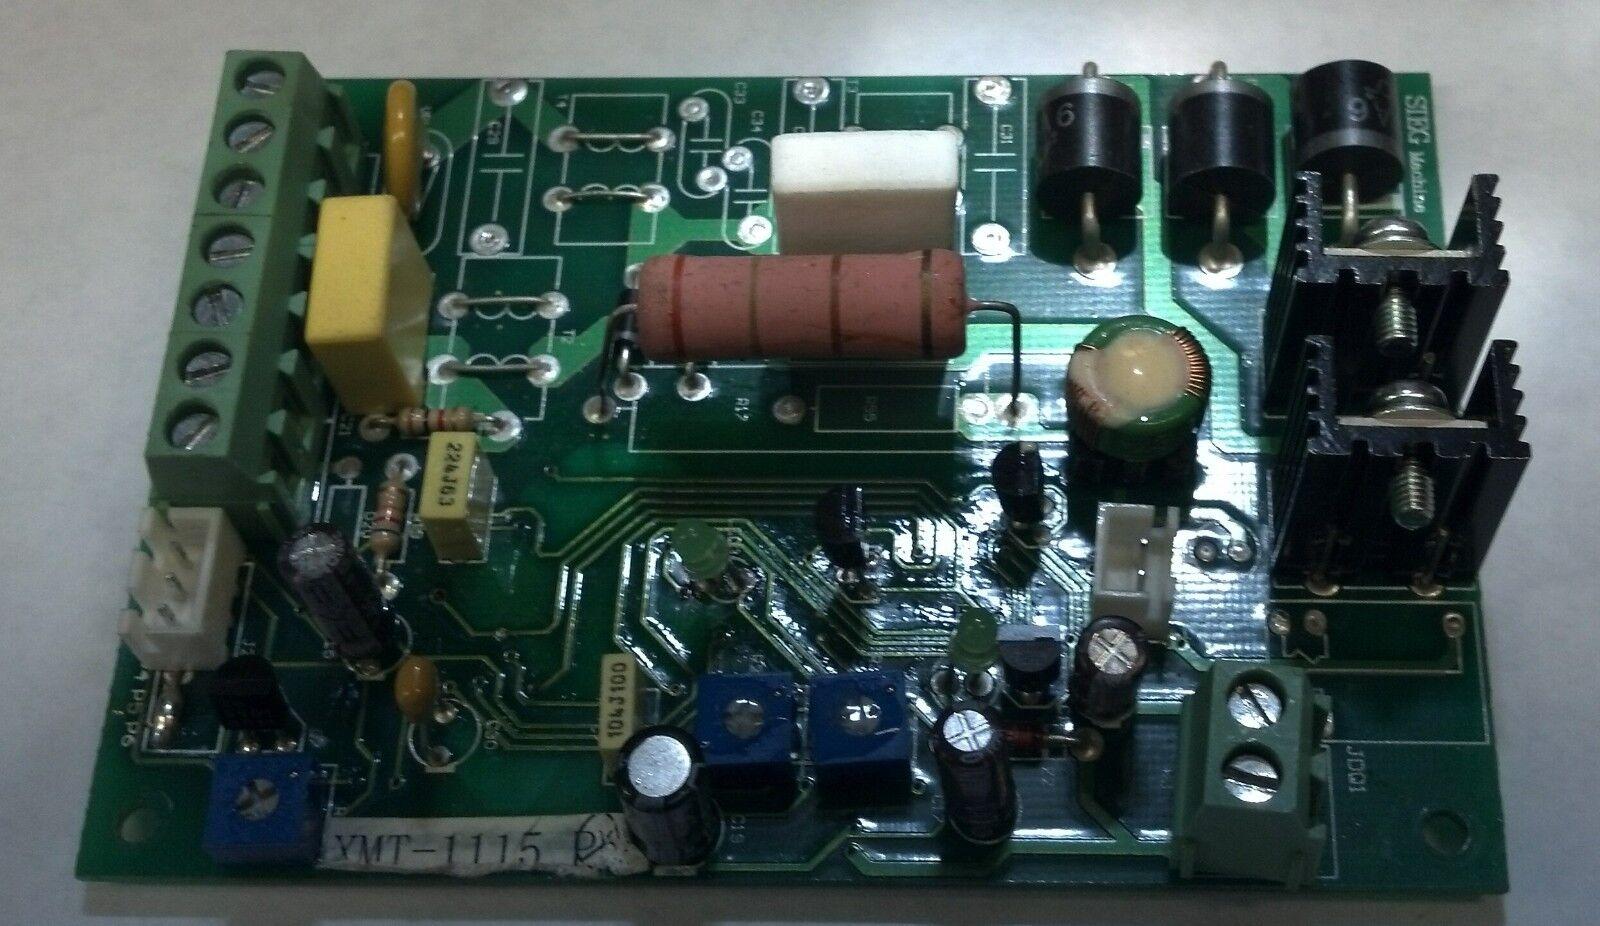 Mini lathe mini mill dc bldc motor speed controller for Small dc motor controller